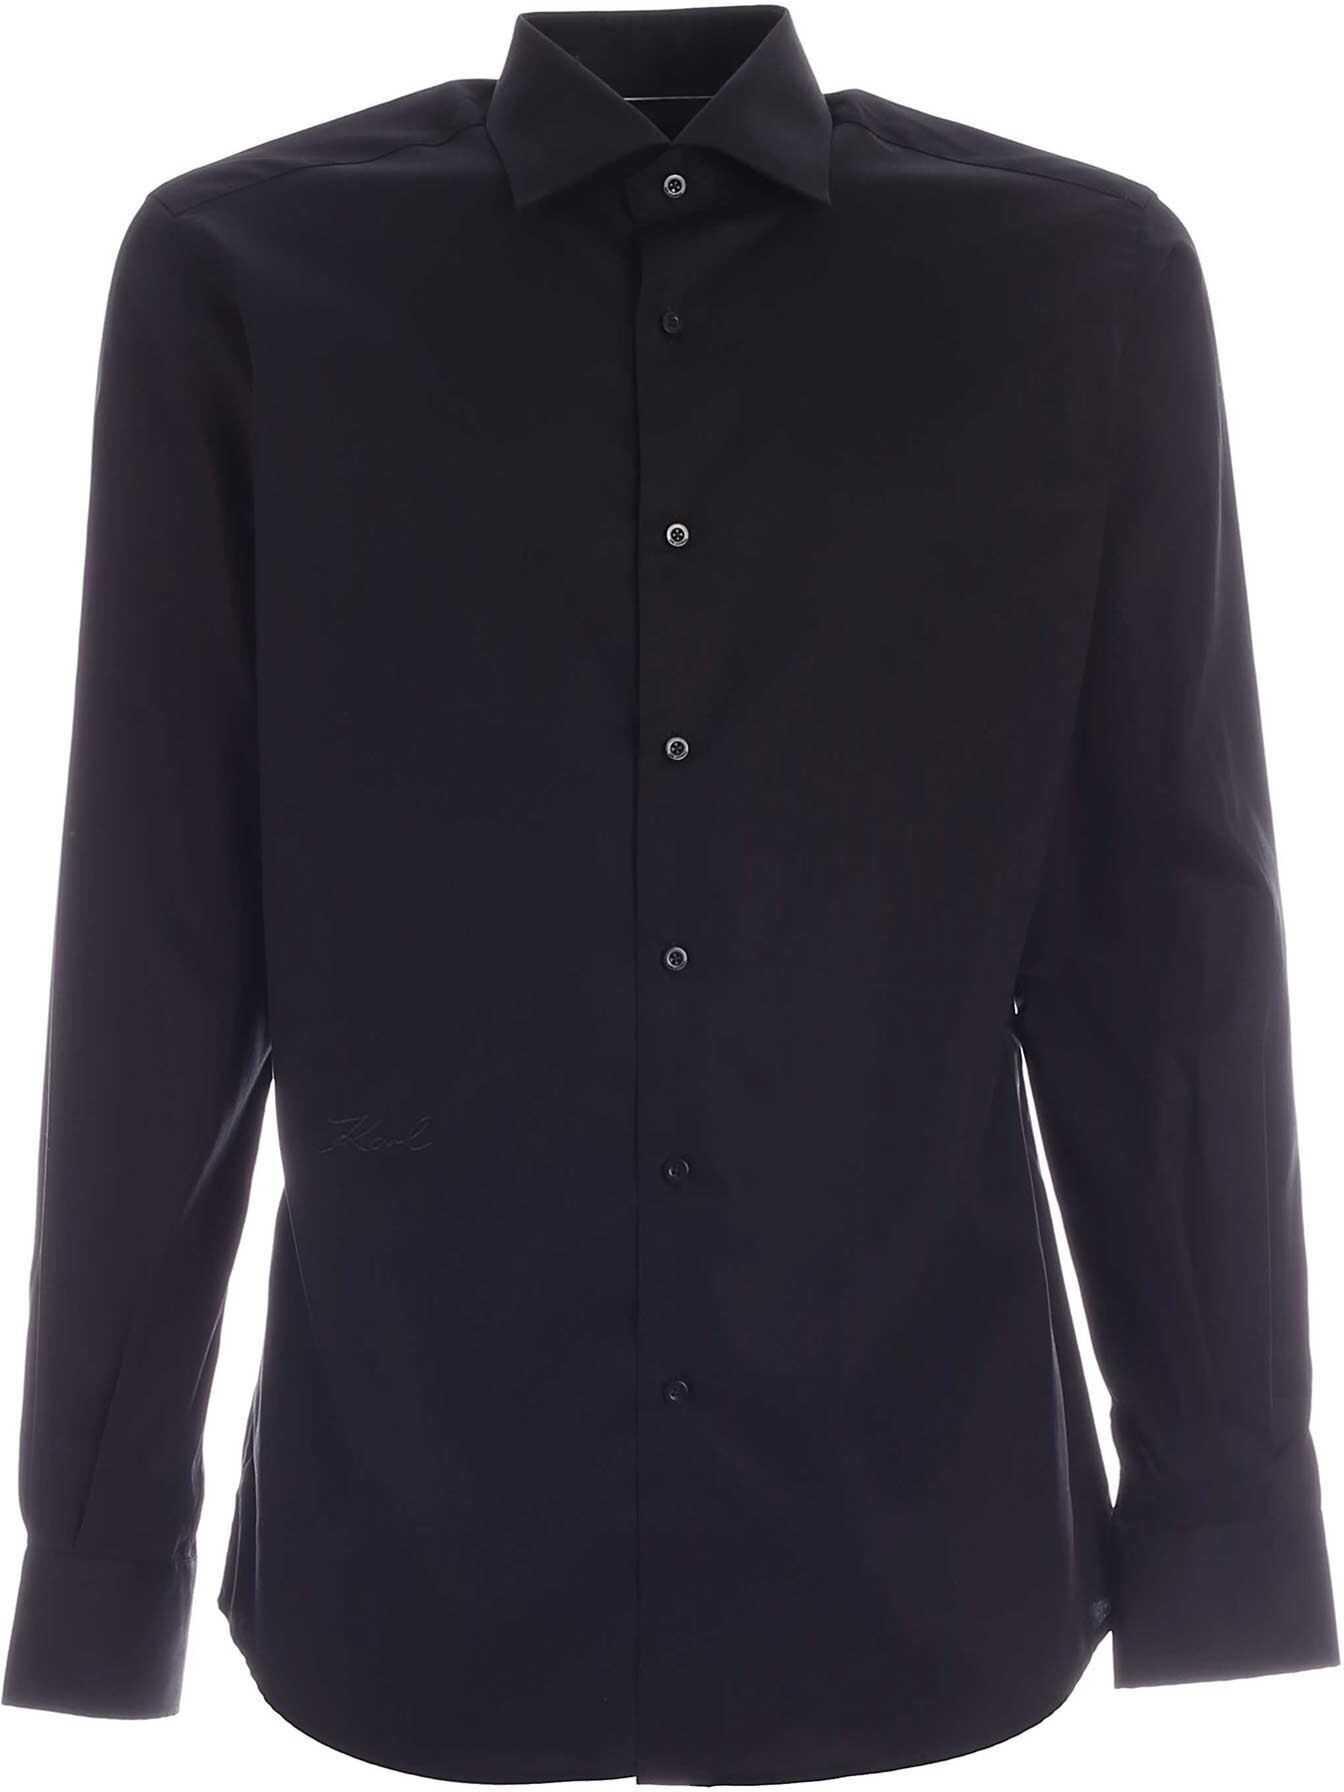 Karl Lagerfeld Signature Logo Shirt In Black Black imagine